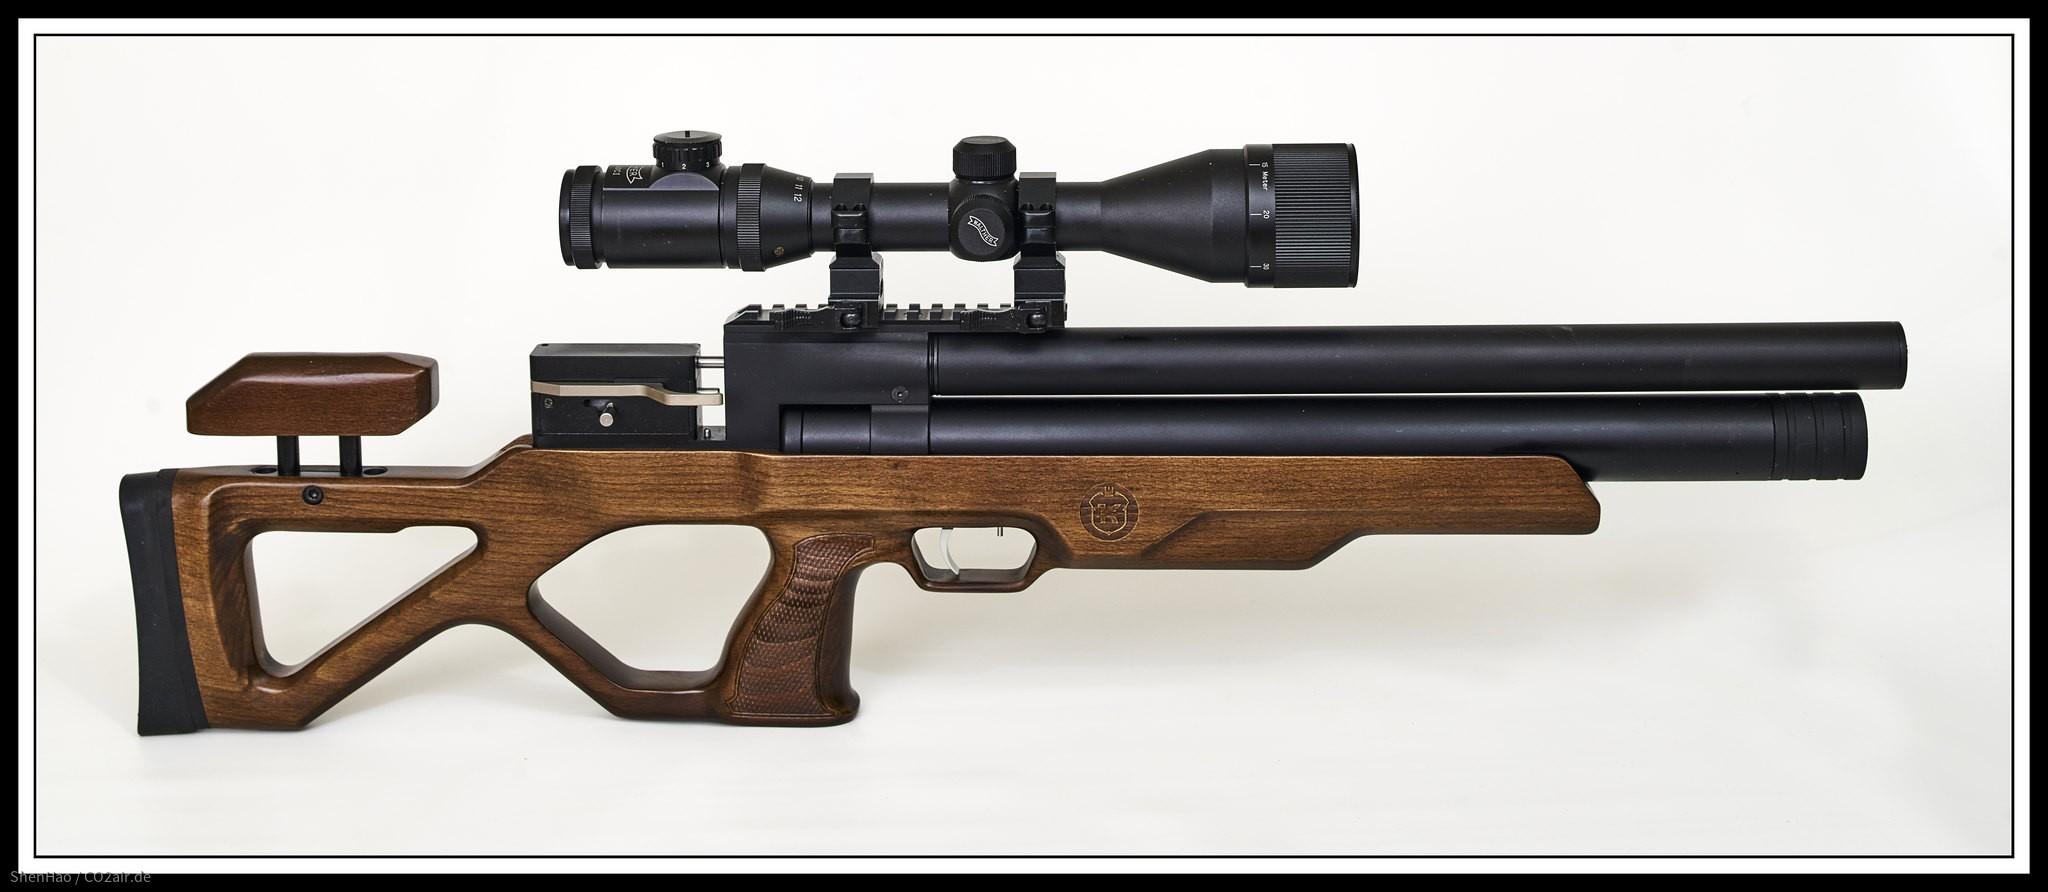 KalibrGun Cricket Minicarbine, cal.22, Vollversion ca. 35 Joule